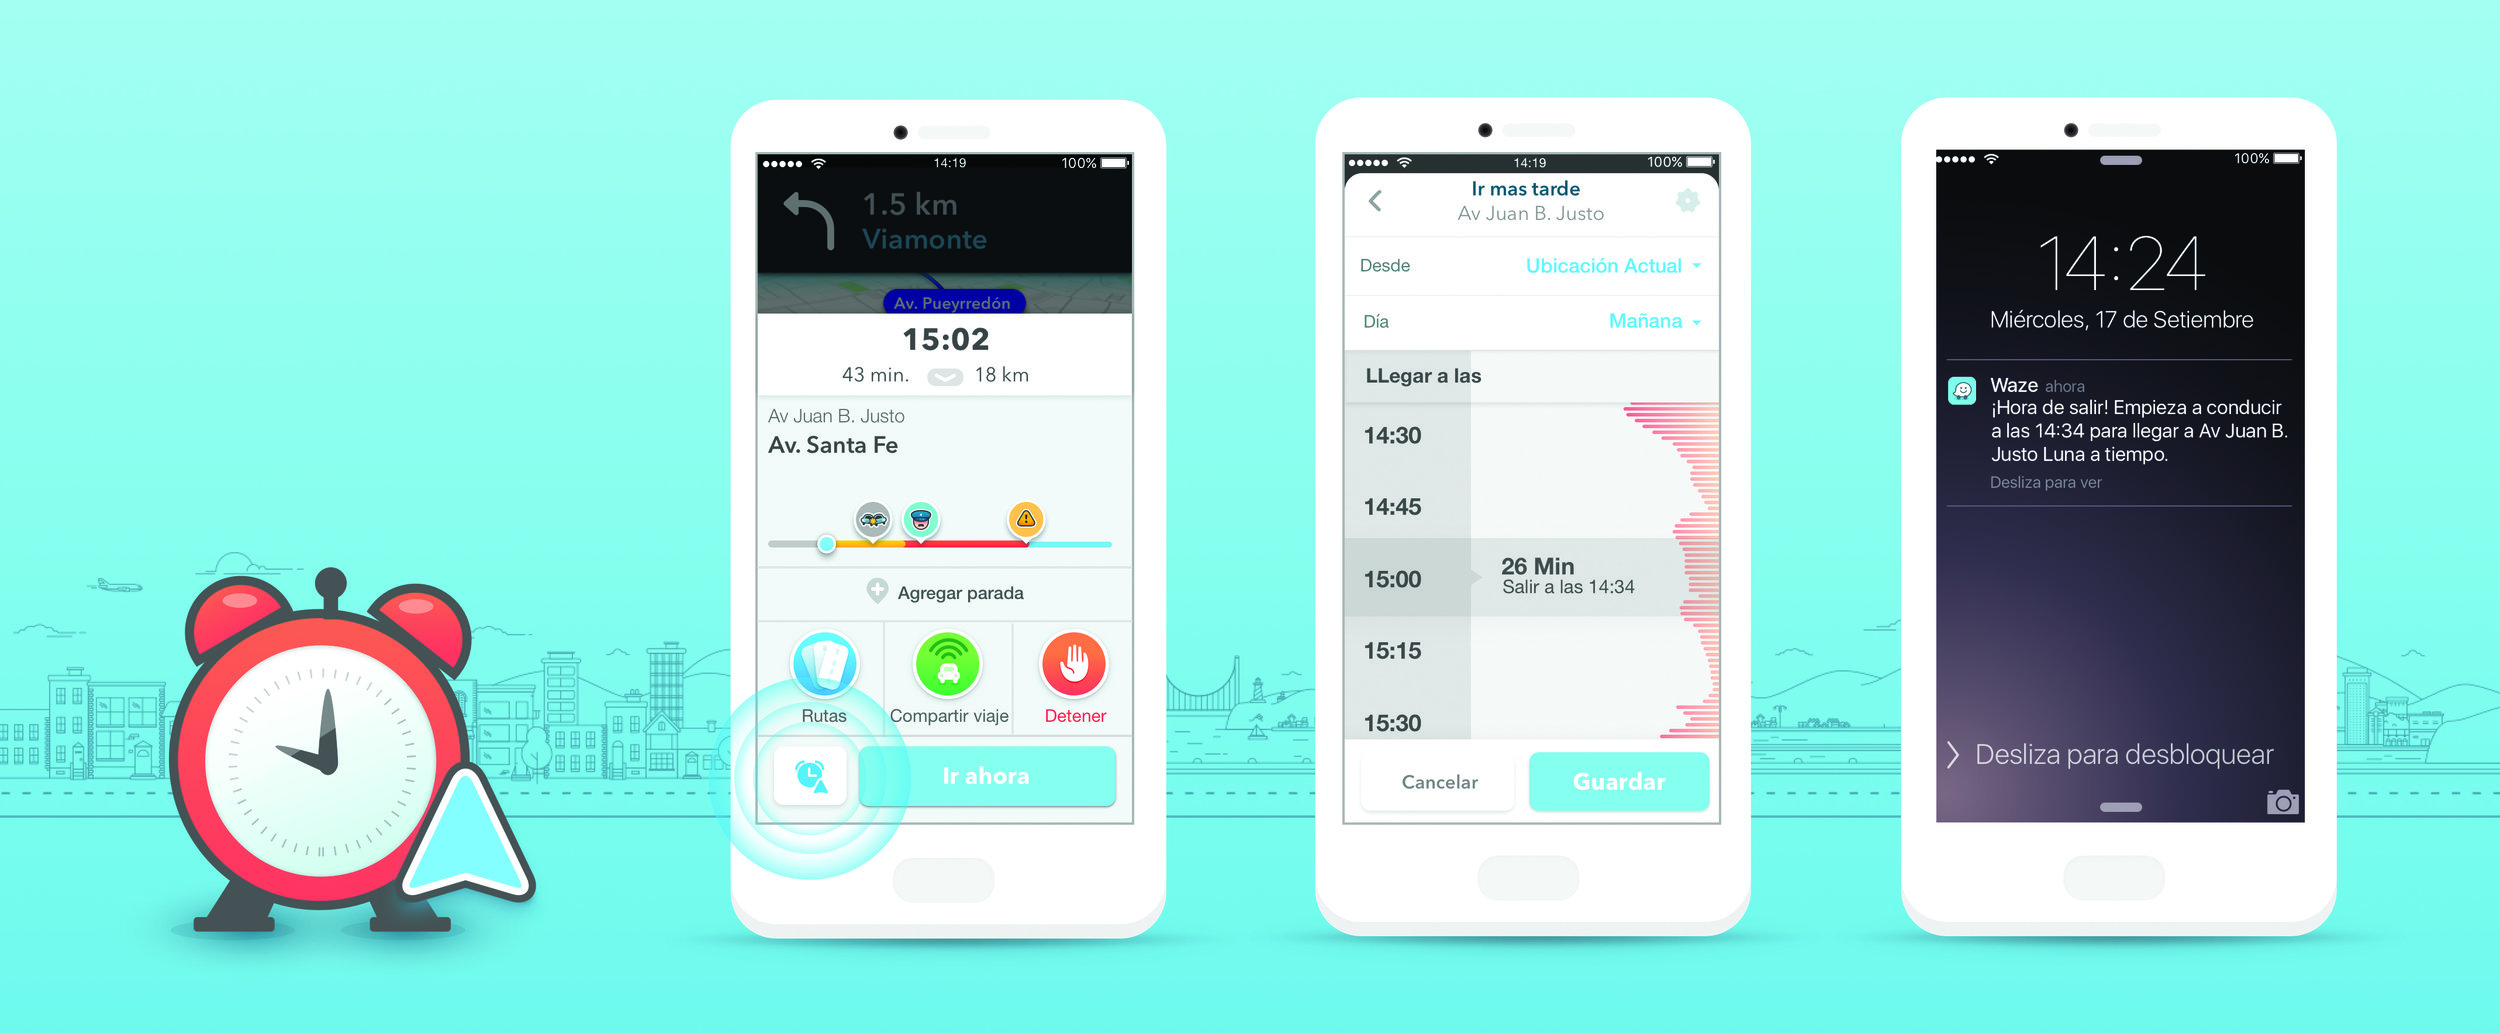 Waze-Planned-Drives_All-iOS-Screens-_Espanol_LatAm_.jpg